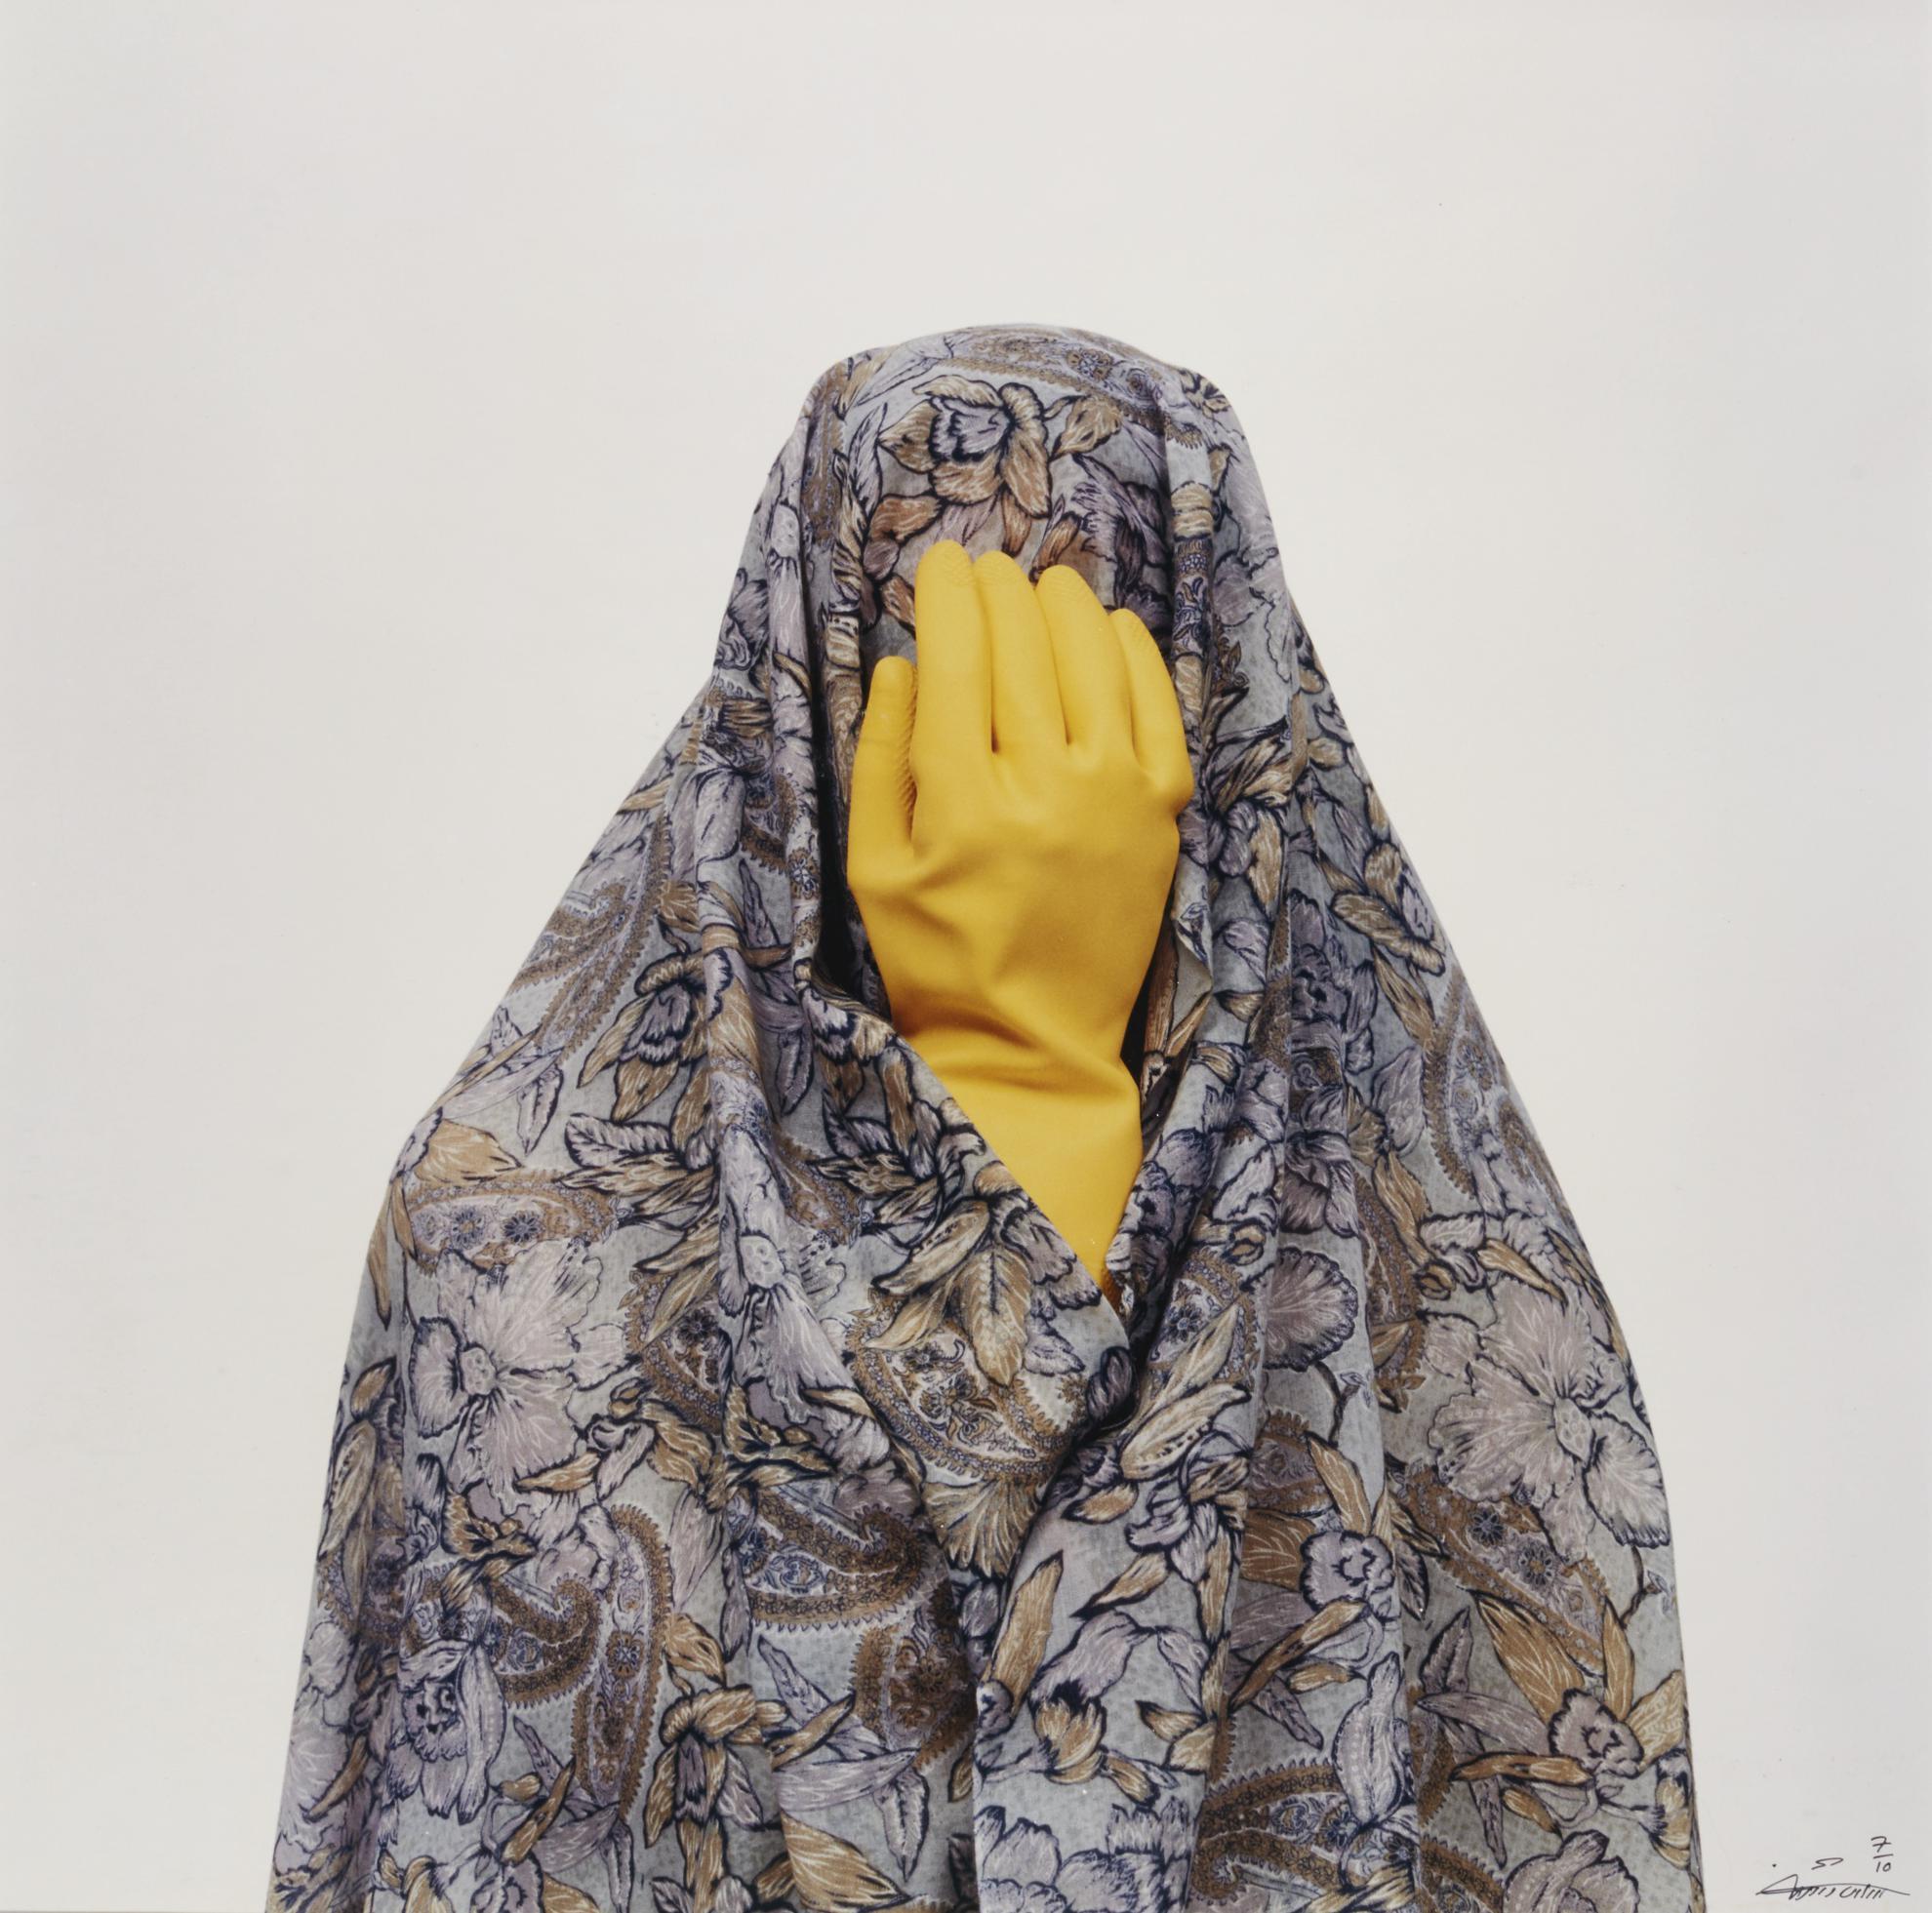 Shadi Ghadirian - Like Everyday-2001